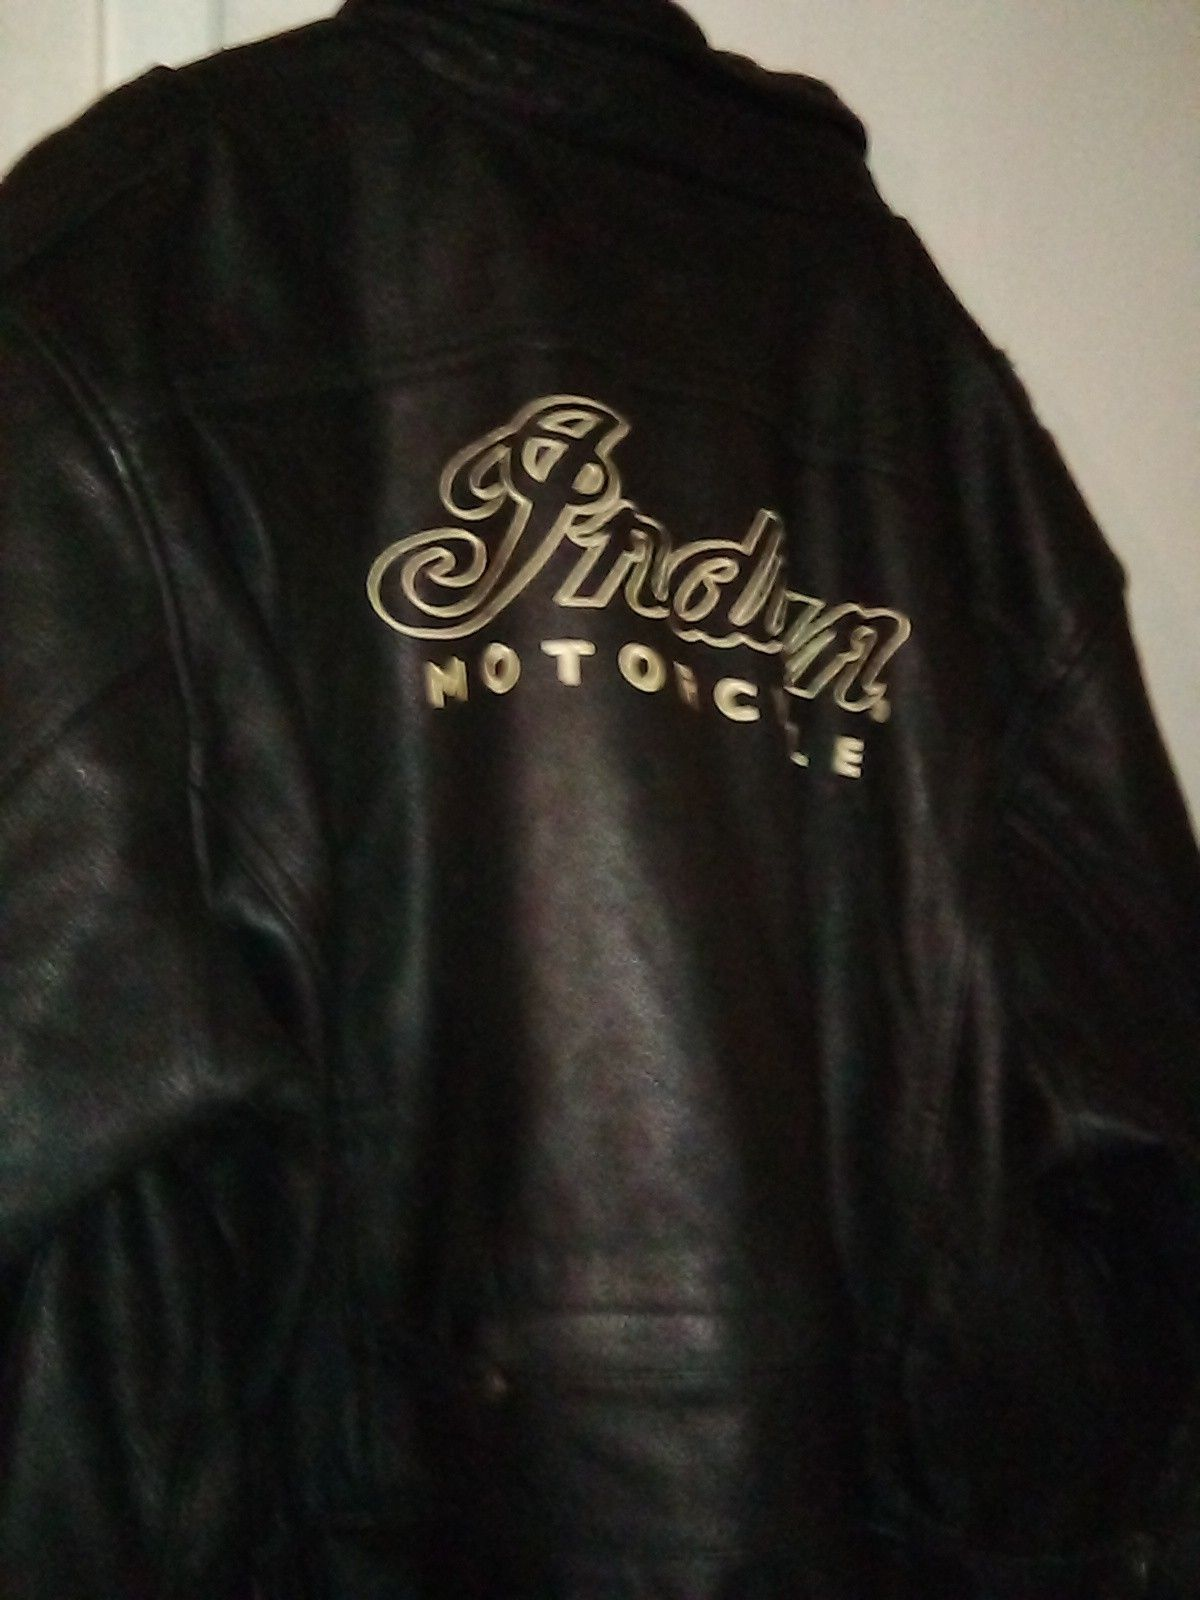 2X black leather Indian motorcycle jacket